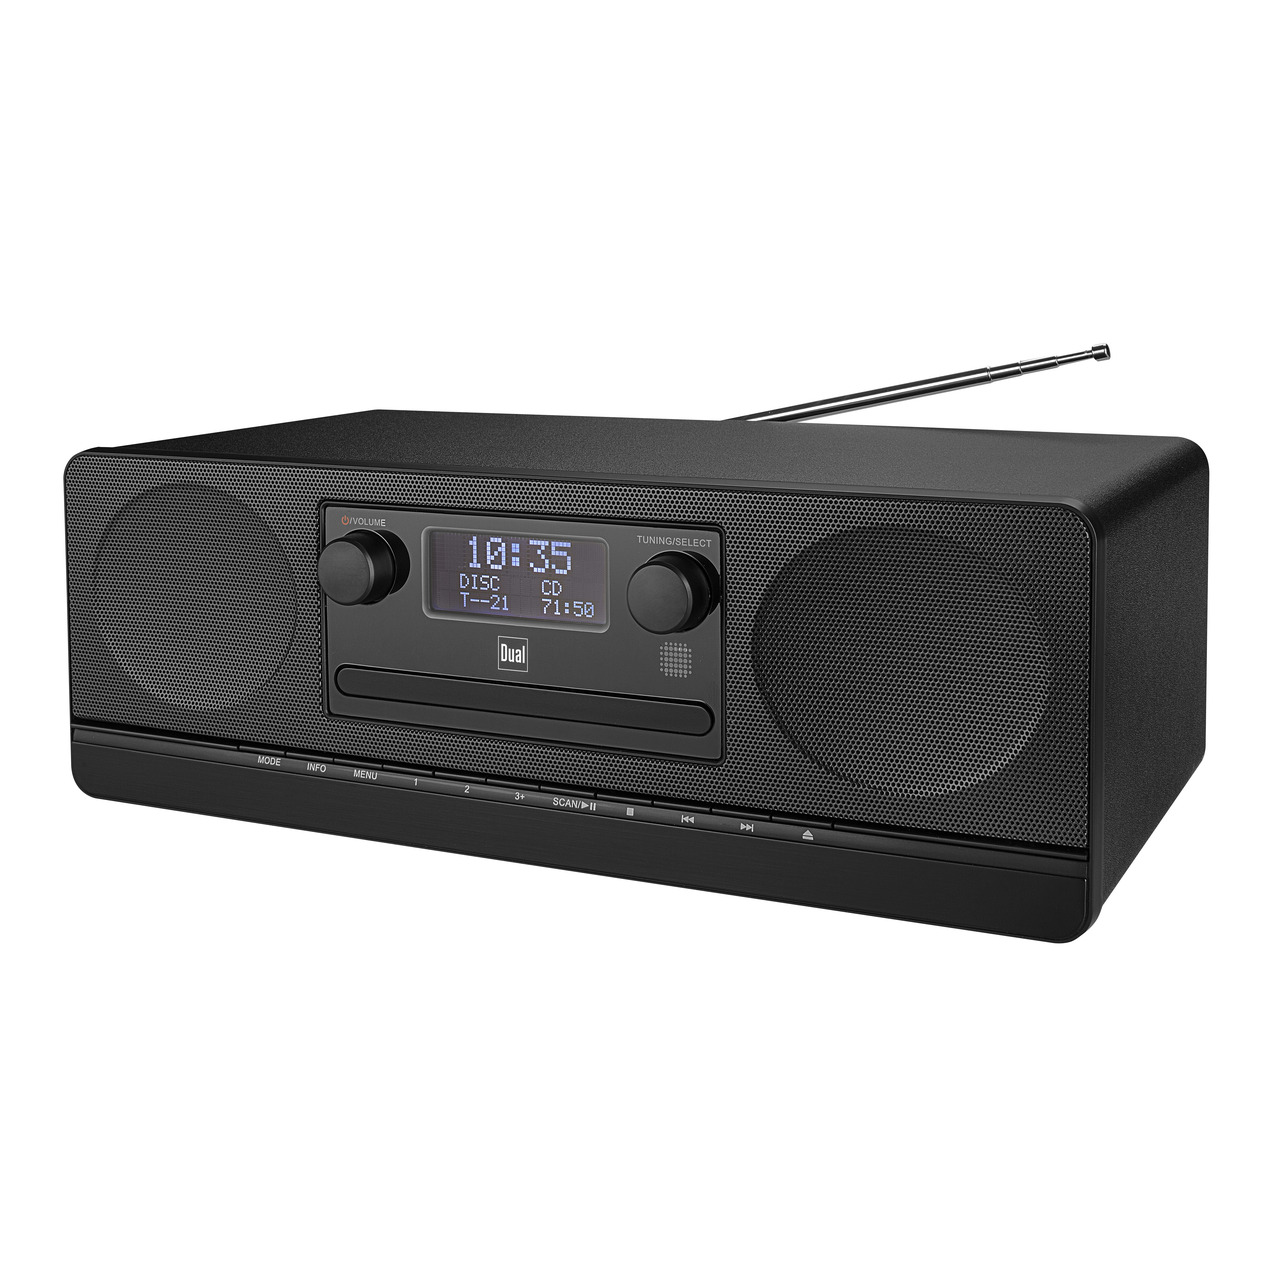 Dual Digitalradio DAB 420BT- UKW-DAB+- Bluetooth- USB- integrierter CD-Player